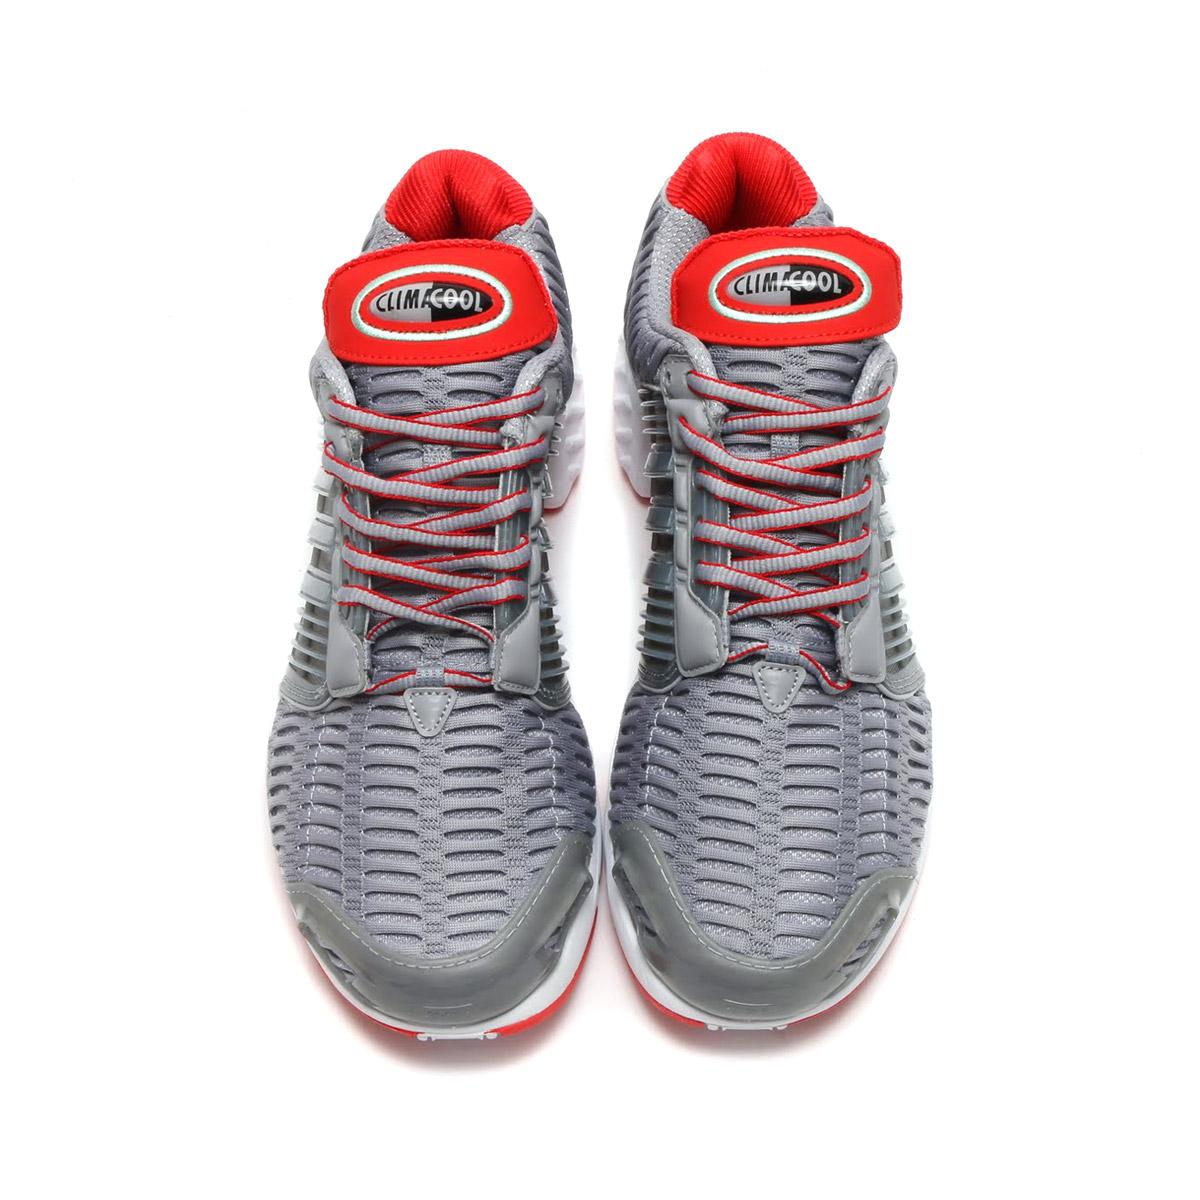 adidas CLIMACOOL 1 (아디다스크라이마크르 1) (Mid Grey S14/Mid Grey S14/Red)